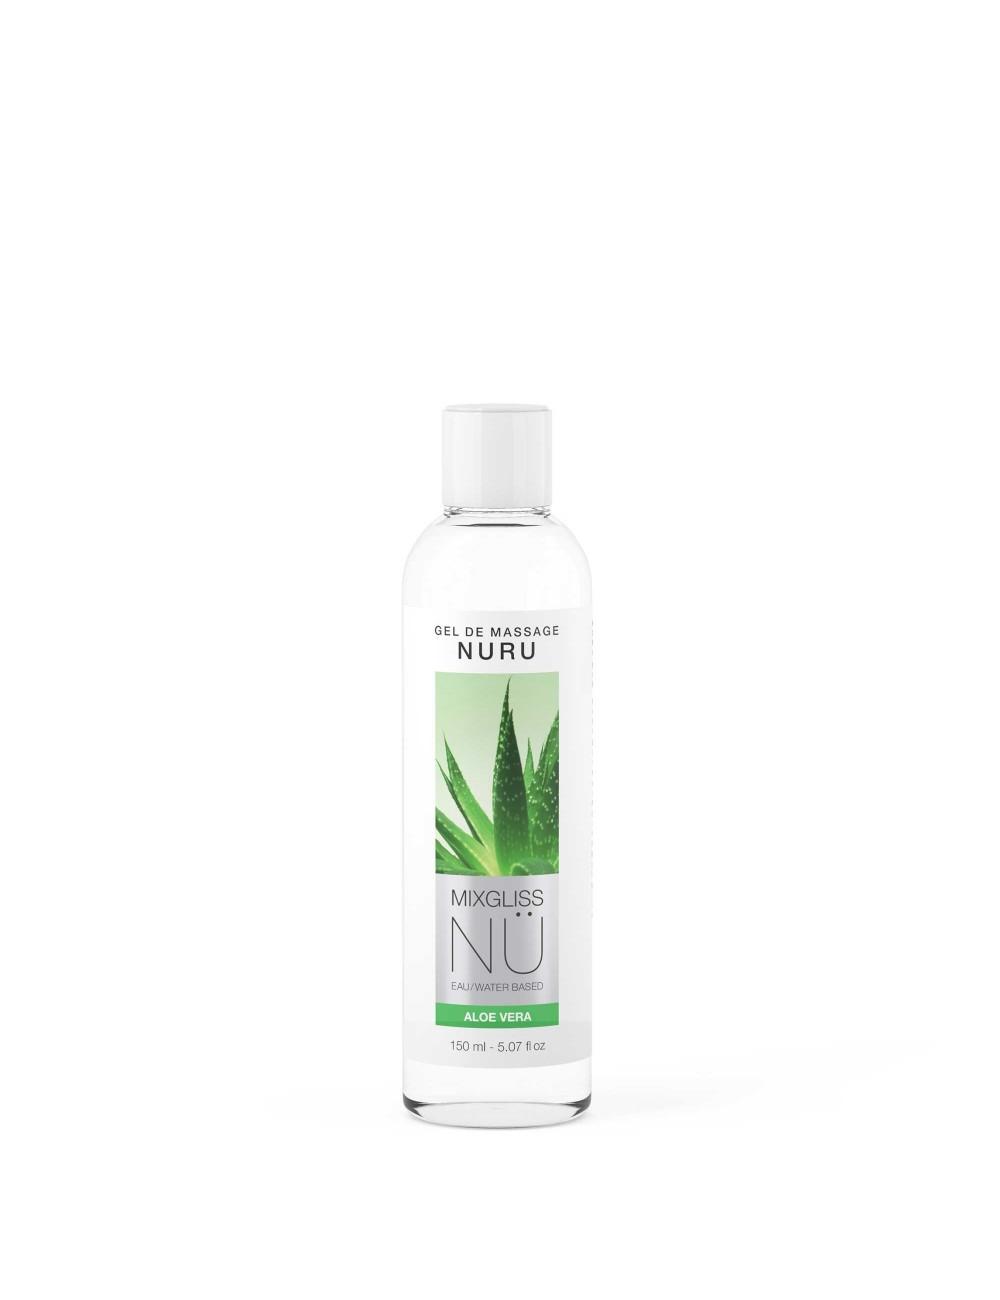 Mixgliss Gel de massage - NU Aloe Vera 150 ml - Huiles de massage - Mixgliss